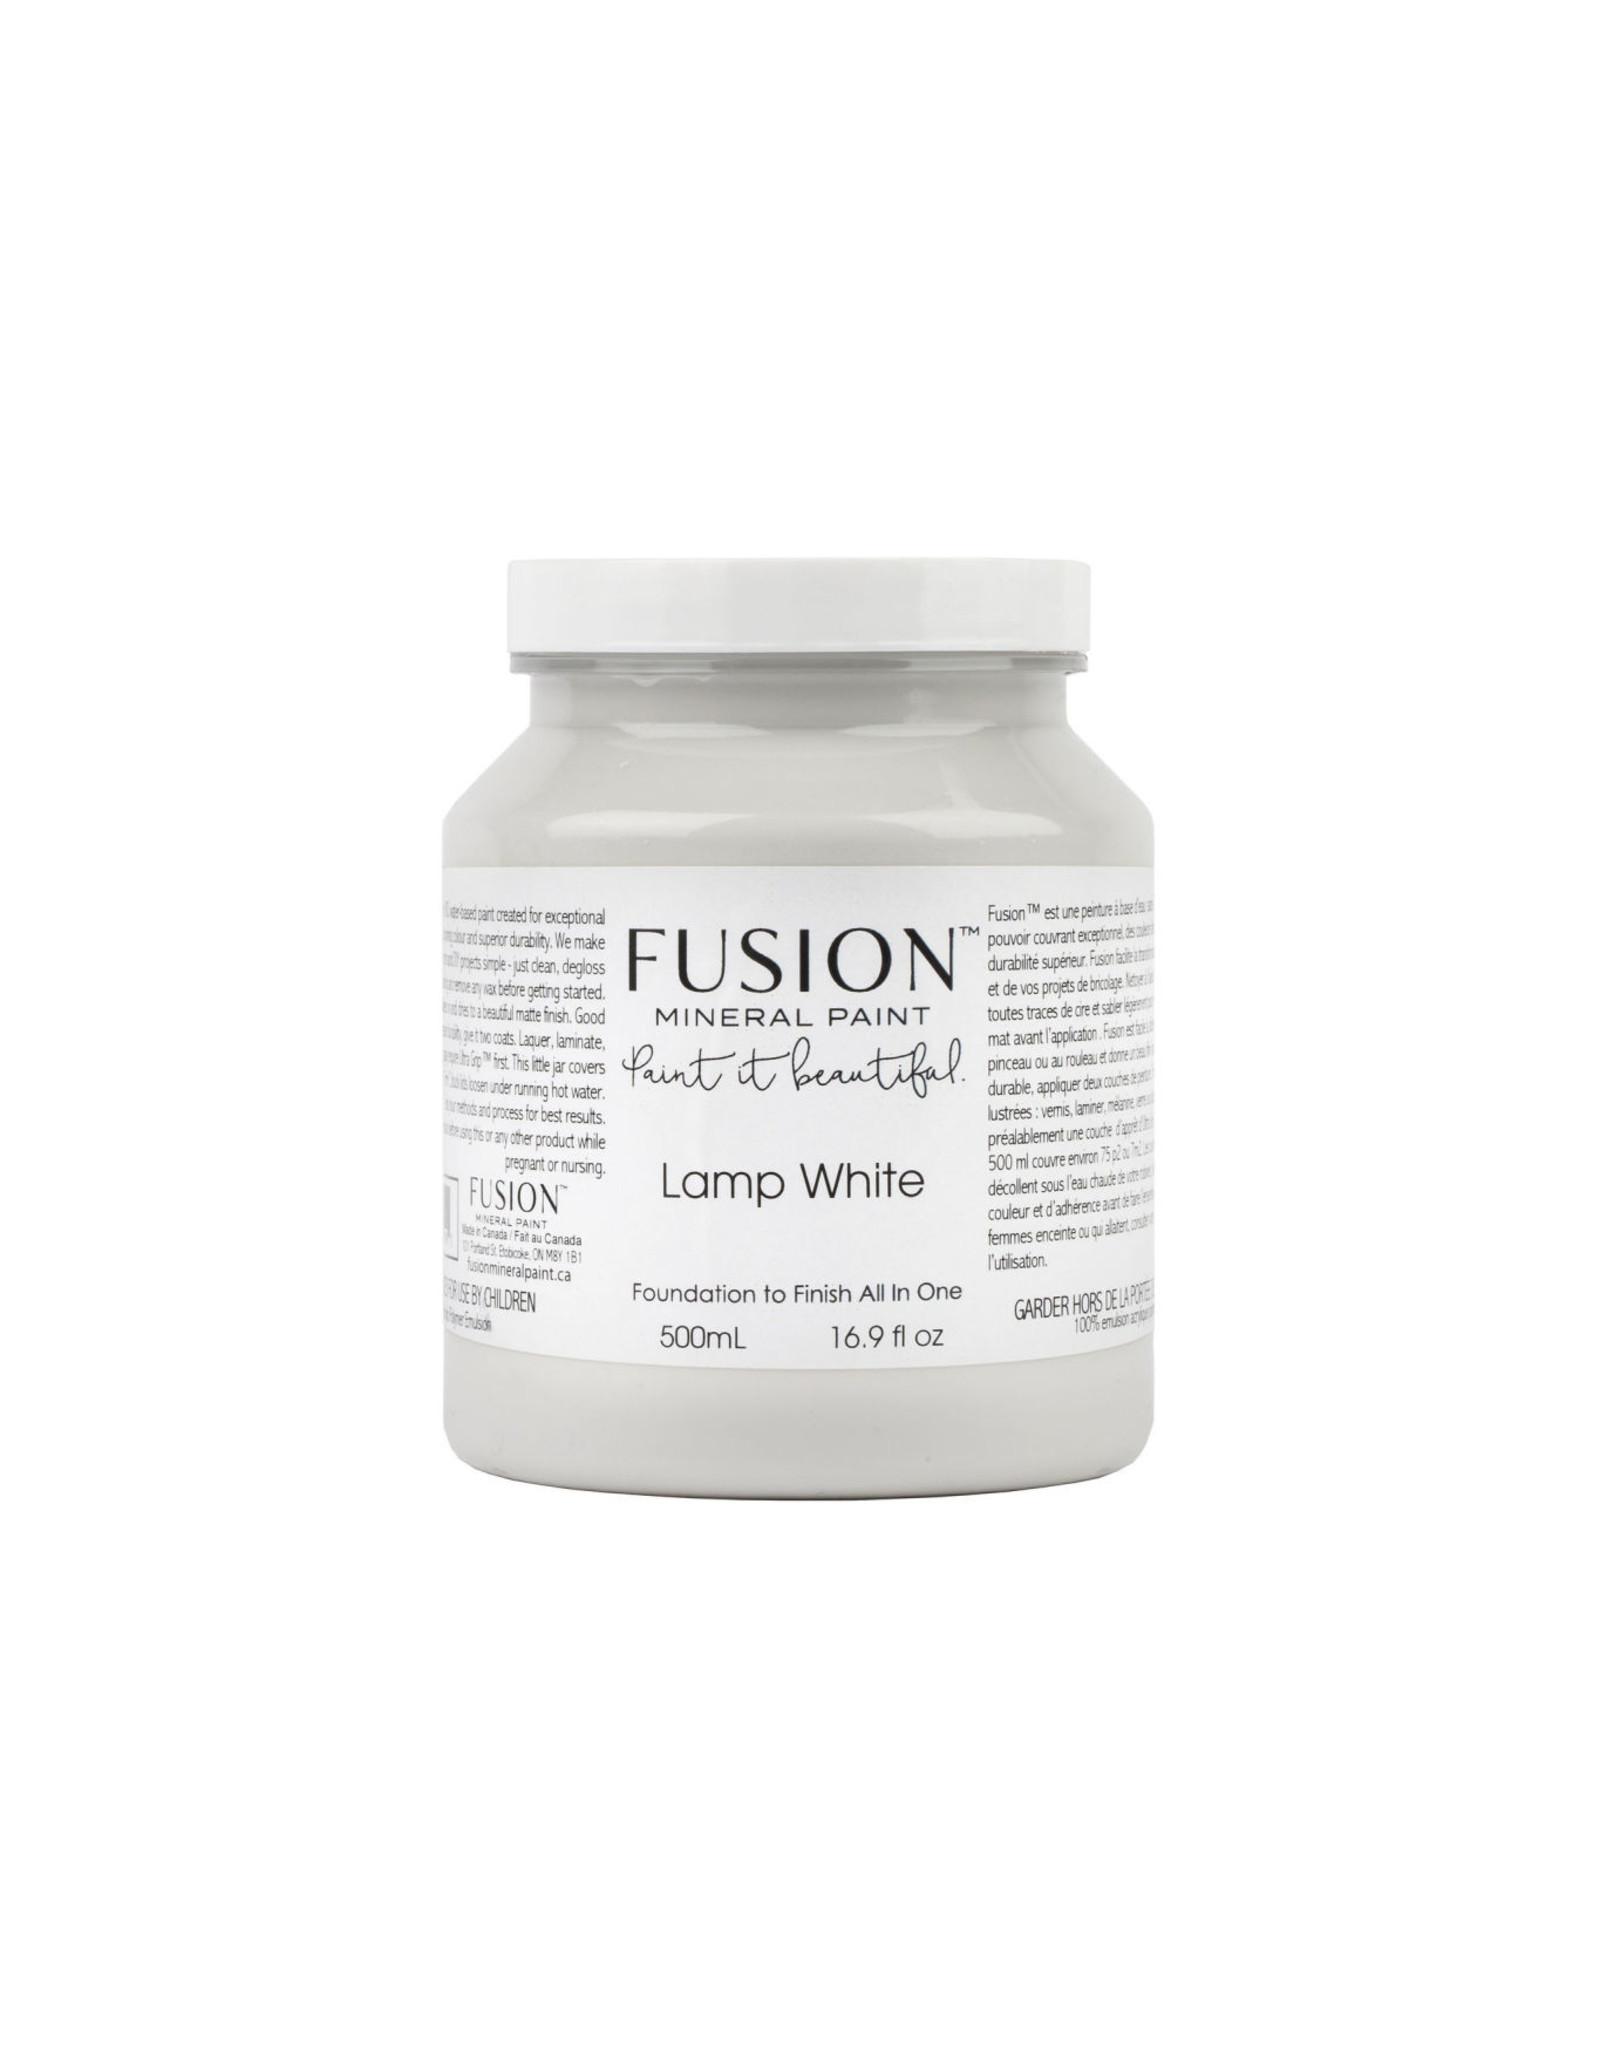 Fusion Mineral Paint Fusion Mineral Paint - Lamp White 500ml